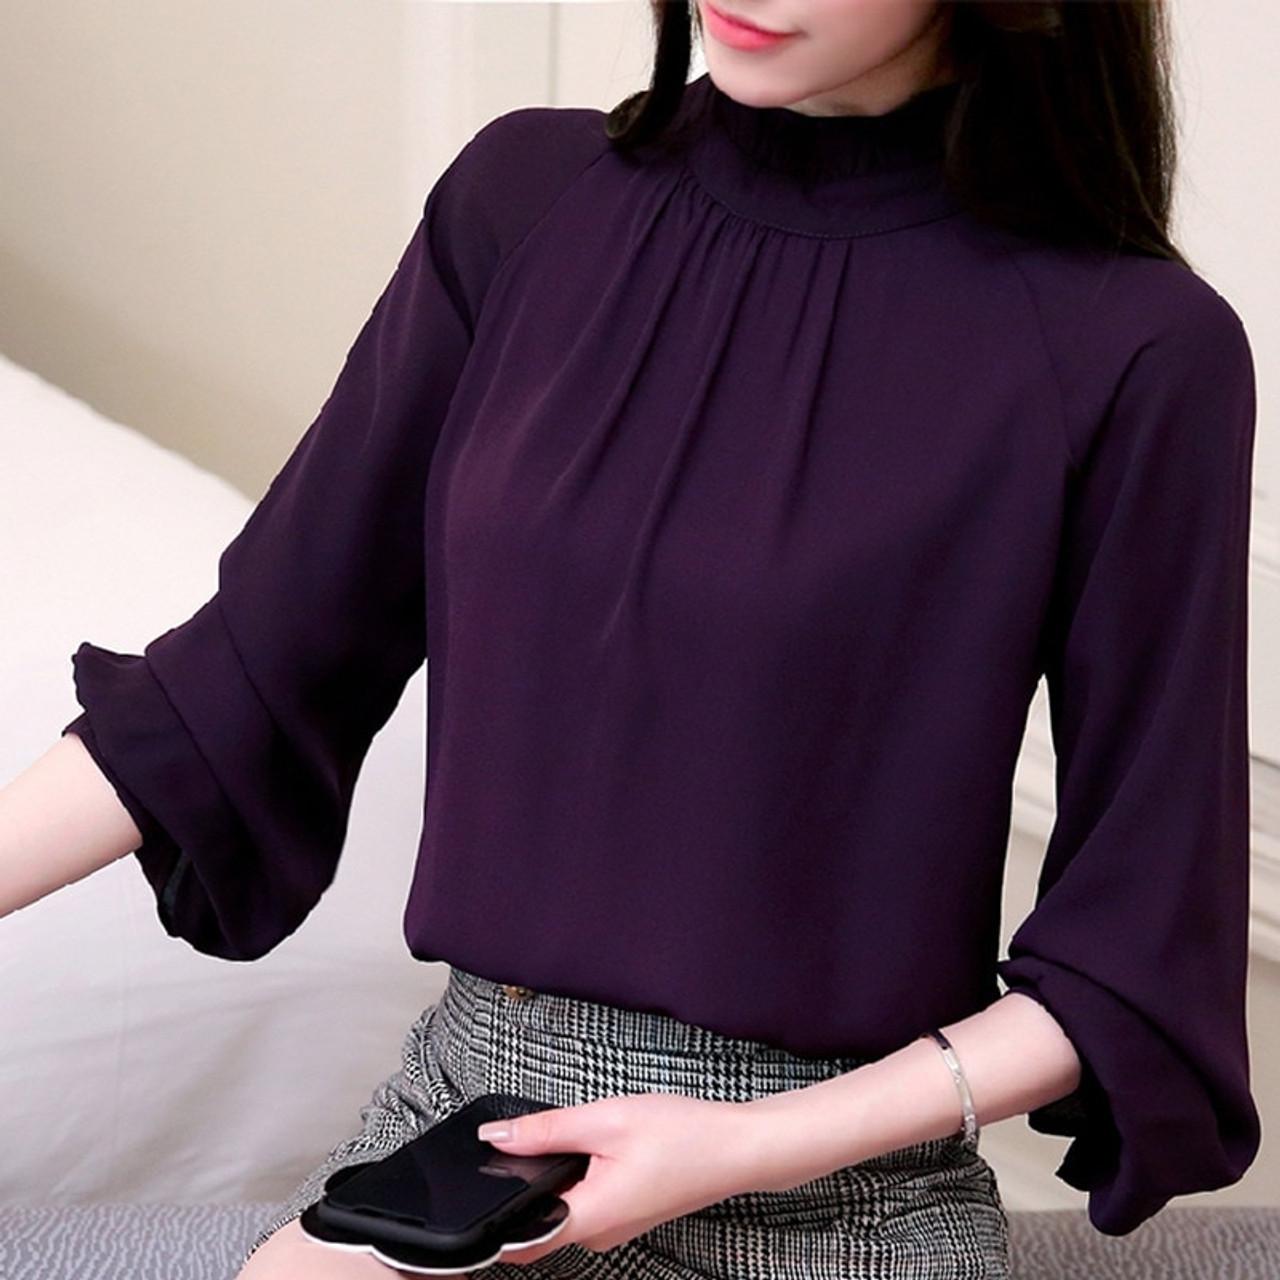 aacd779cda57bb New Autumn 2018 womens tops and blouses Long Sleeve Chiffon Blouse Mujer  Fashion Ladies Shirts Tops ...